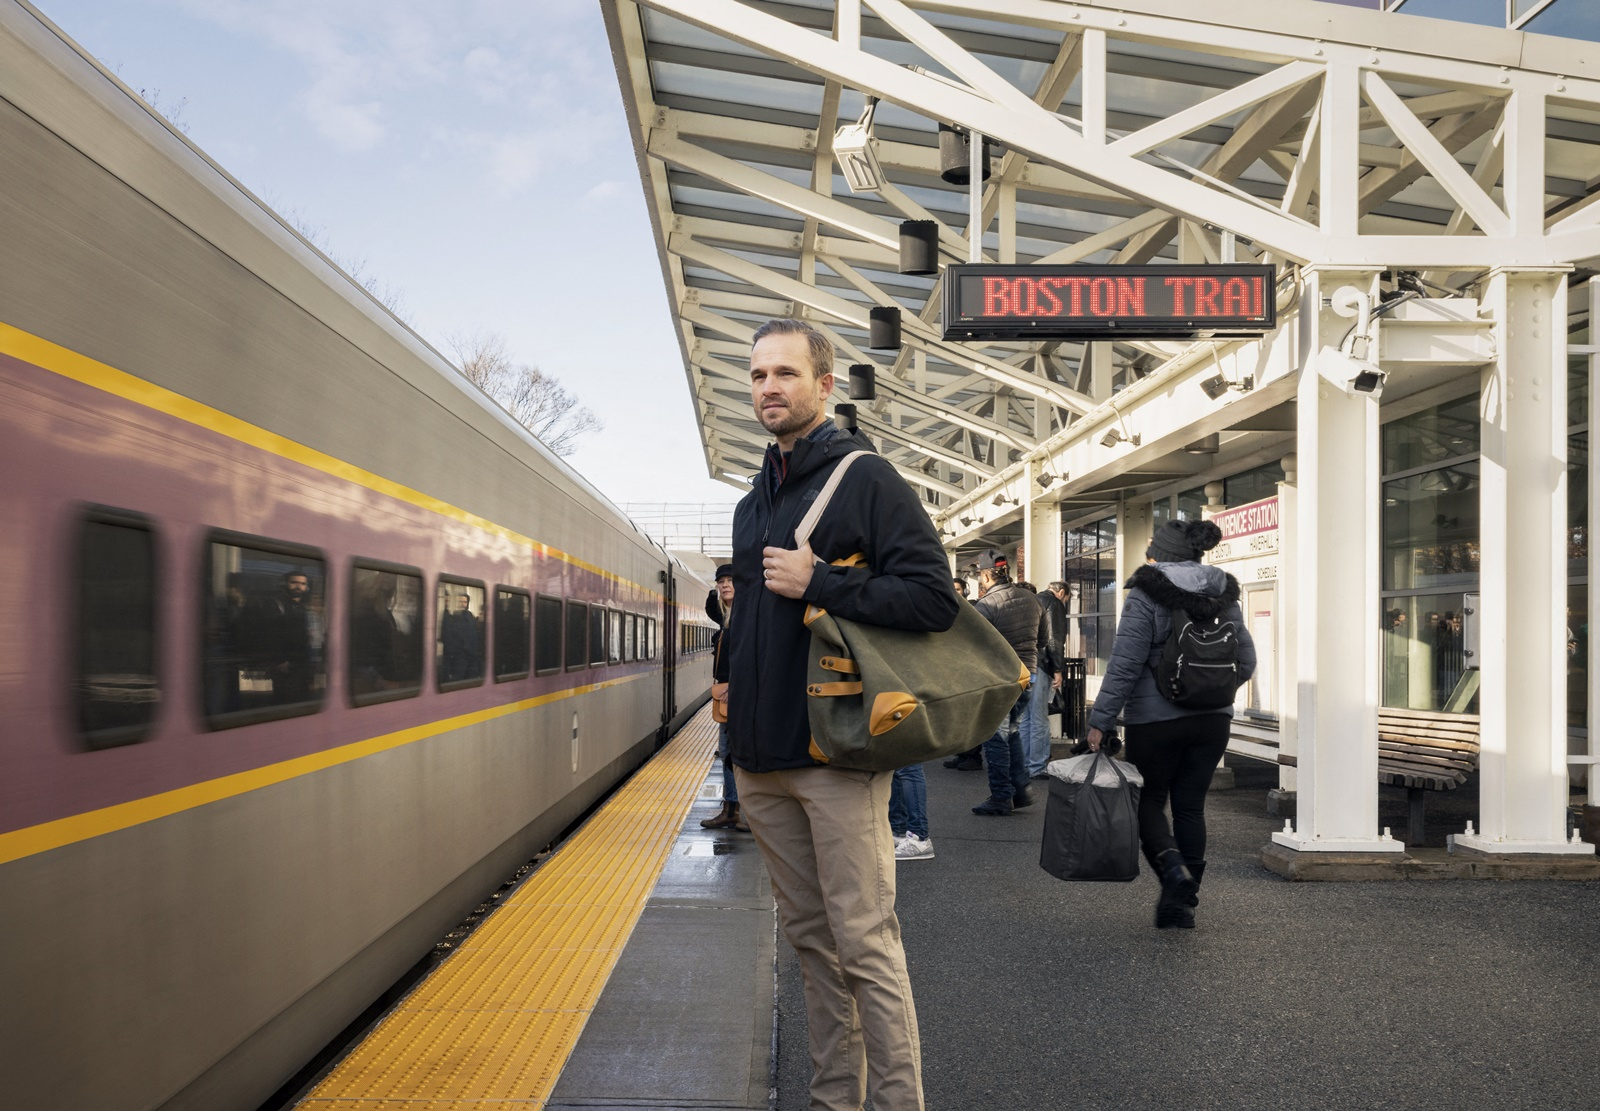 Railway Station at Riverwalk West, Massachusetts, 01843